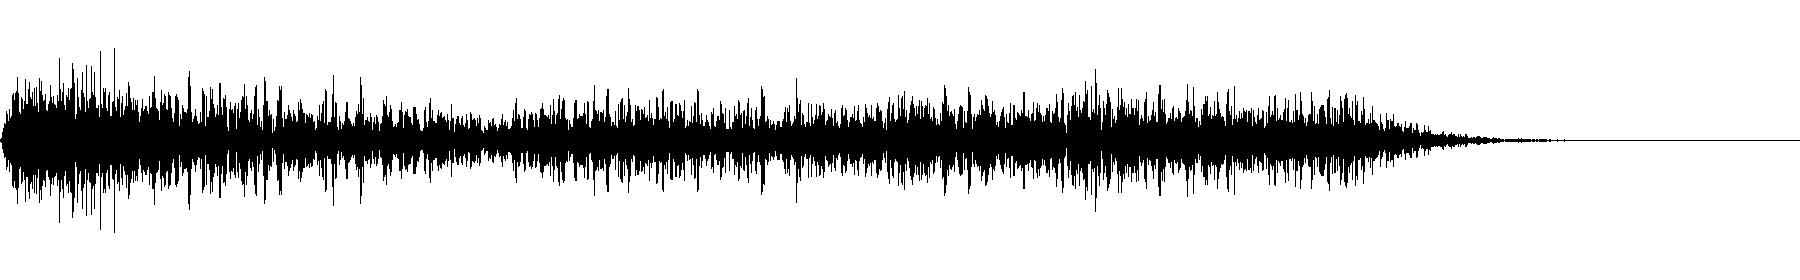 80 brass c minor 7